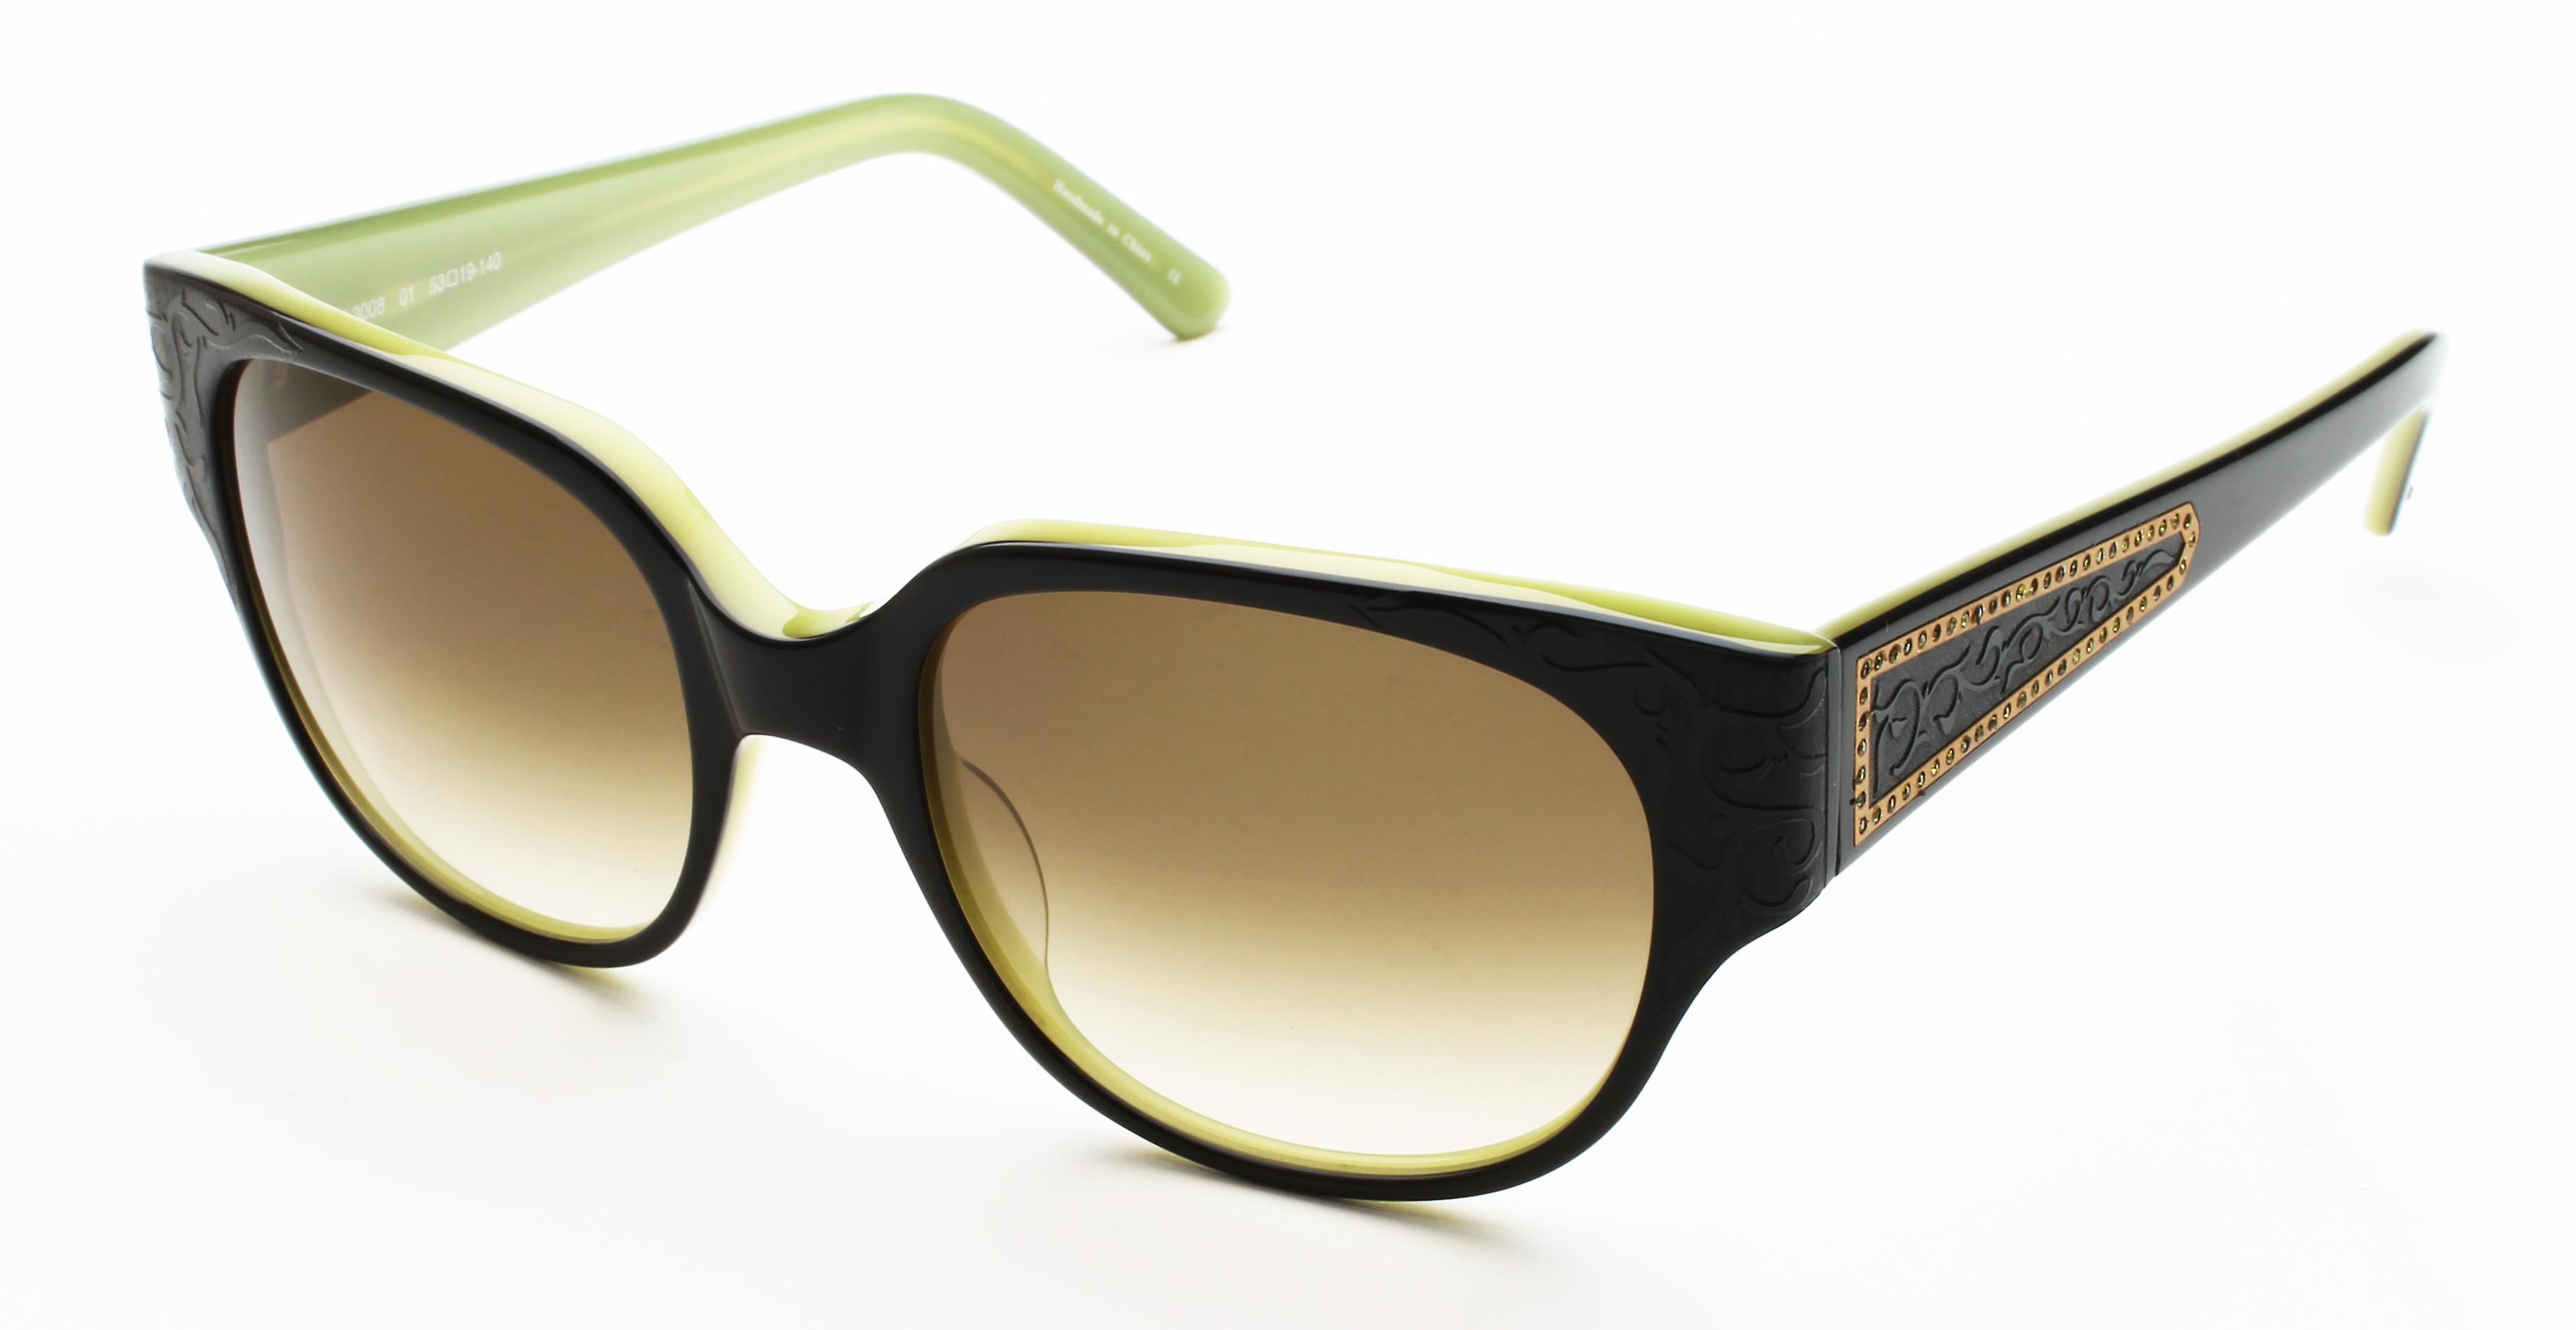 Judith Leiber Women's Floral Motif Sunglasses Onyx/Olive